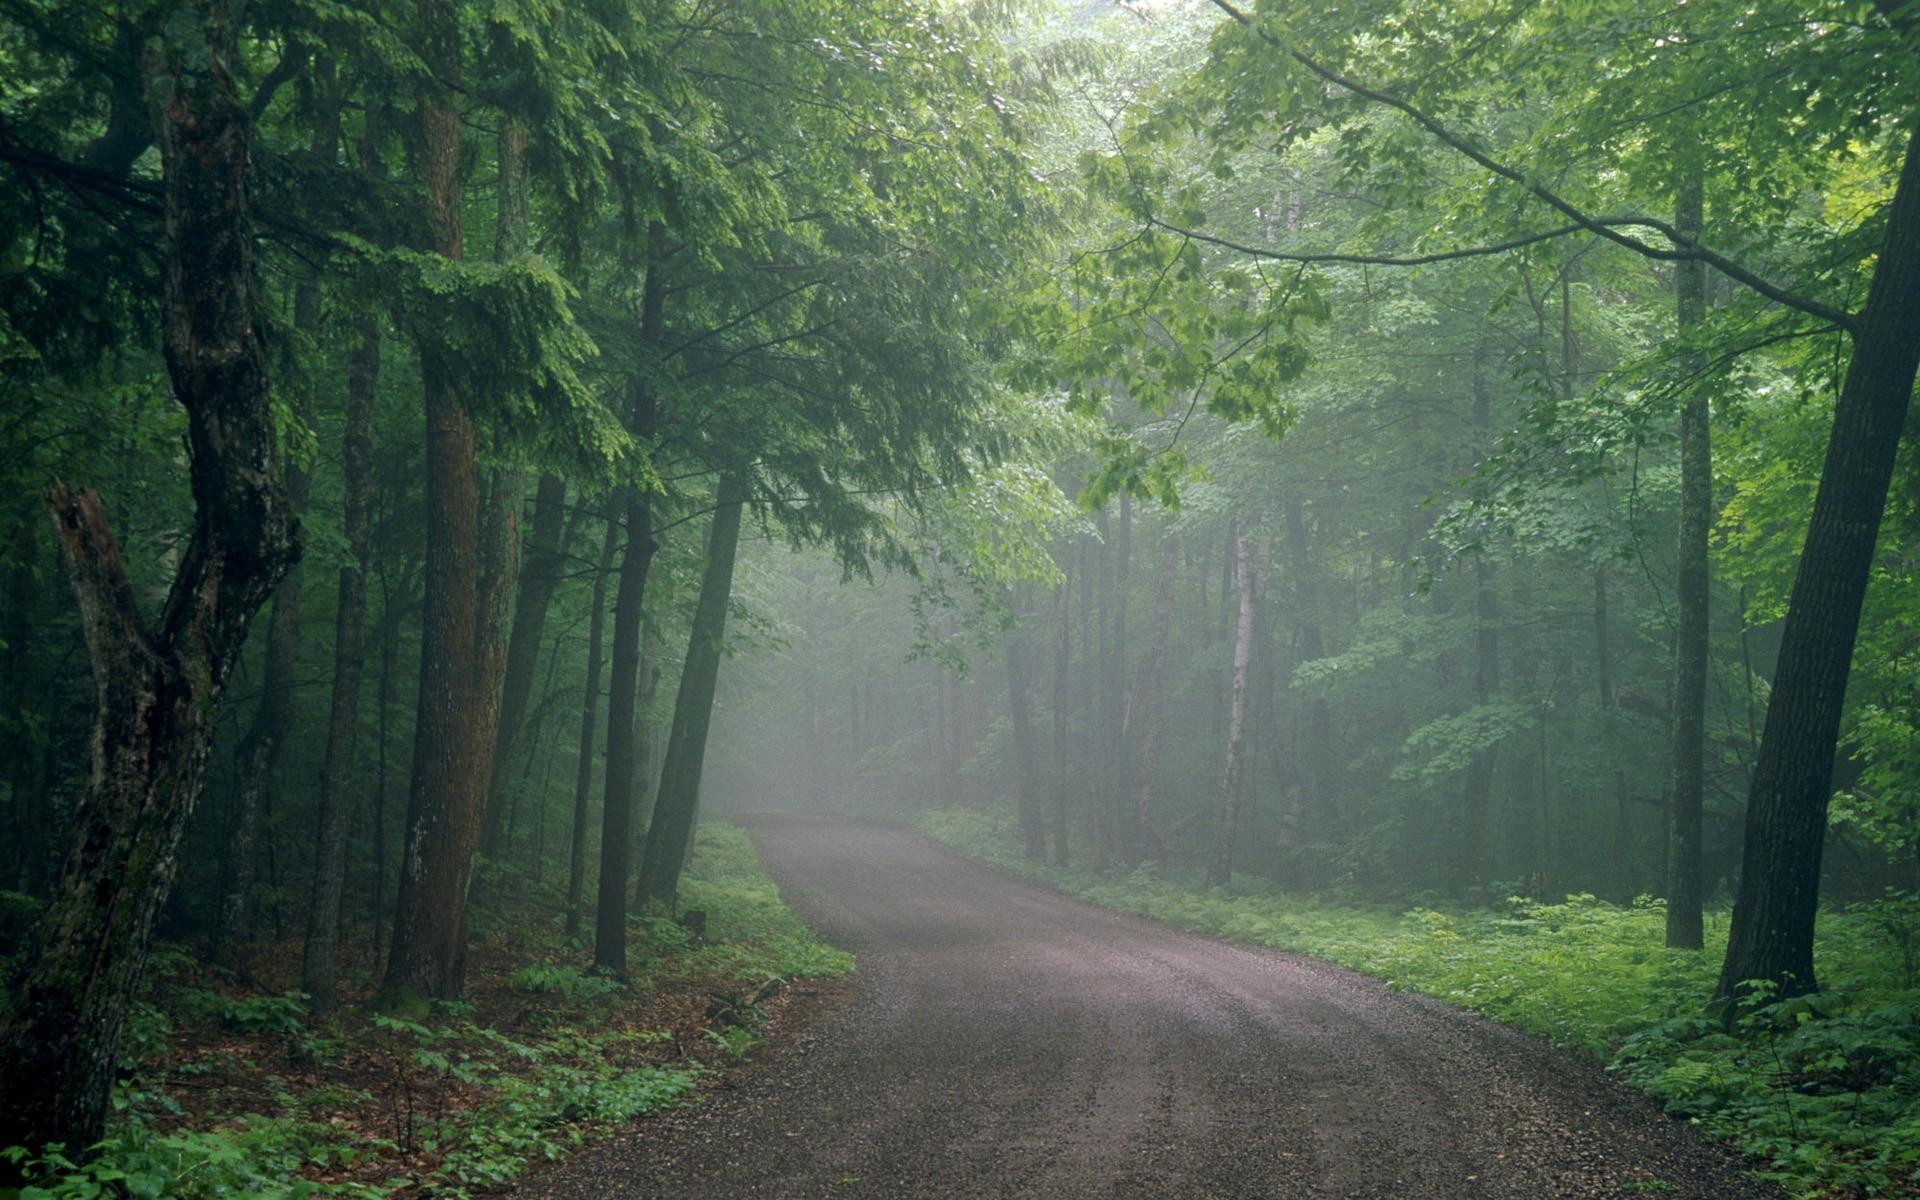 Road through foggy forest wallpaper 6204 1920x1200